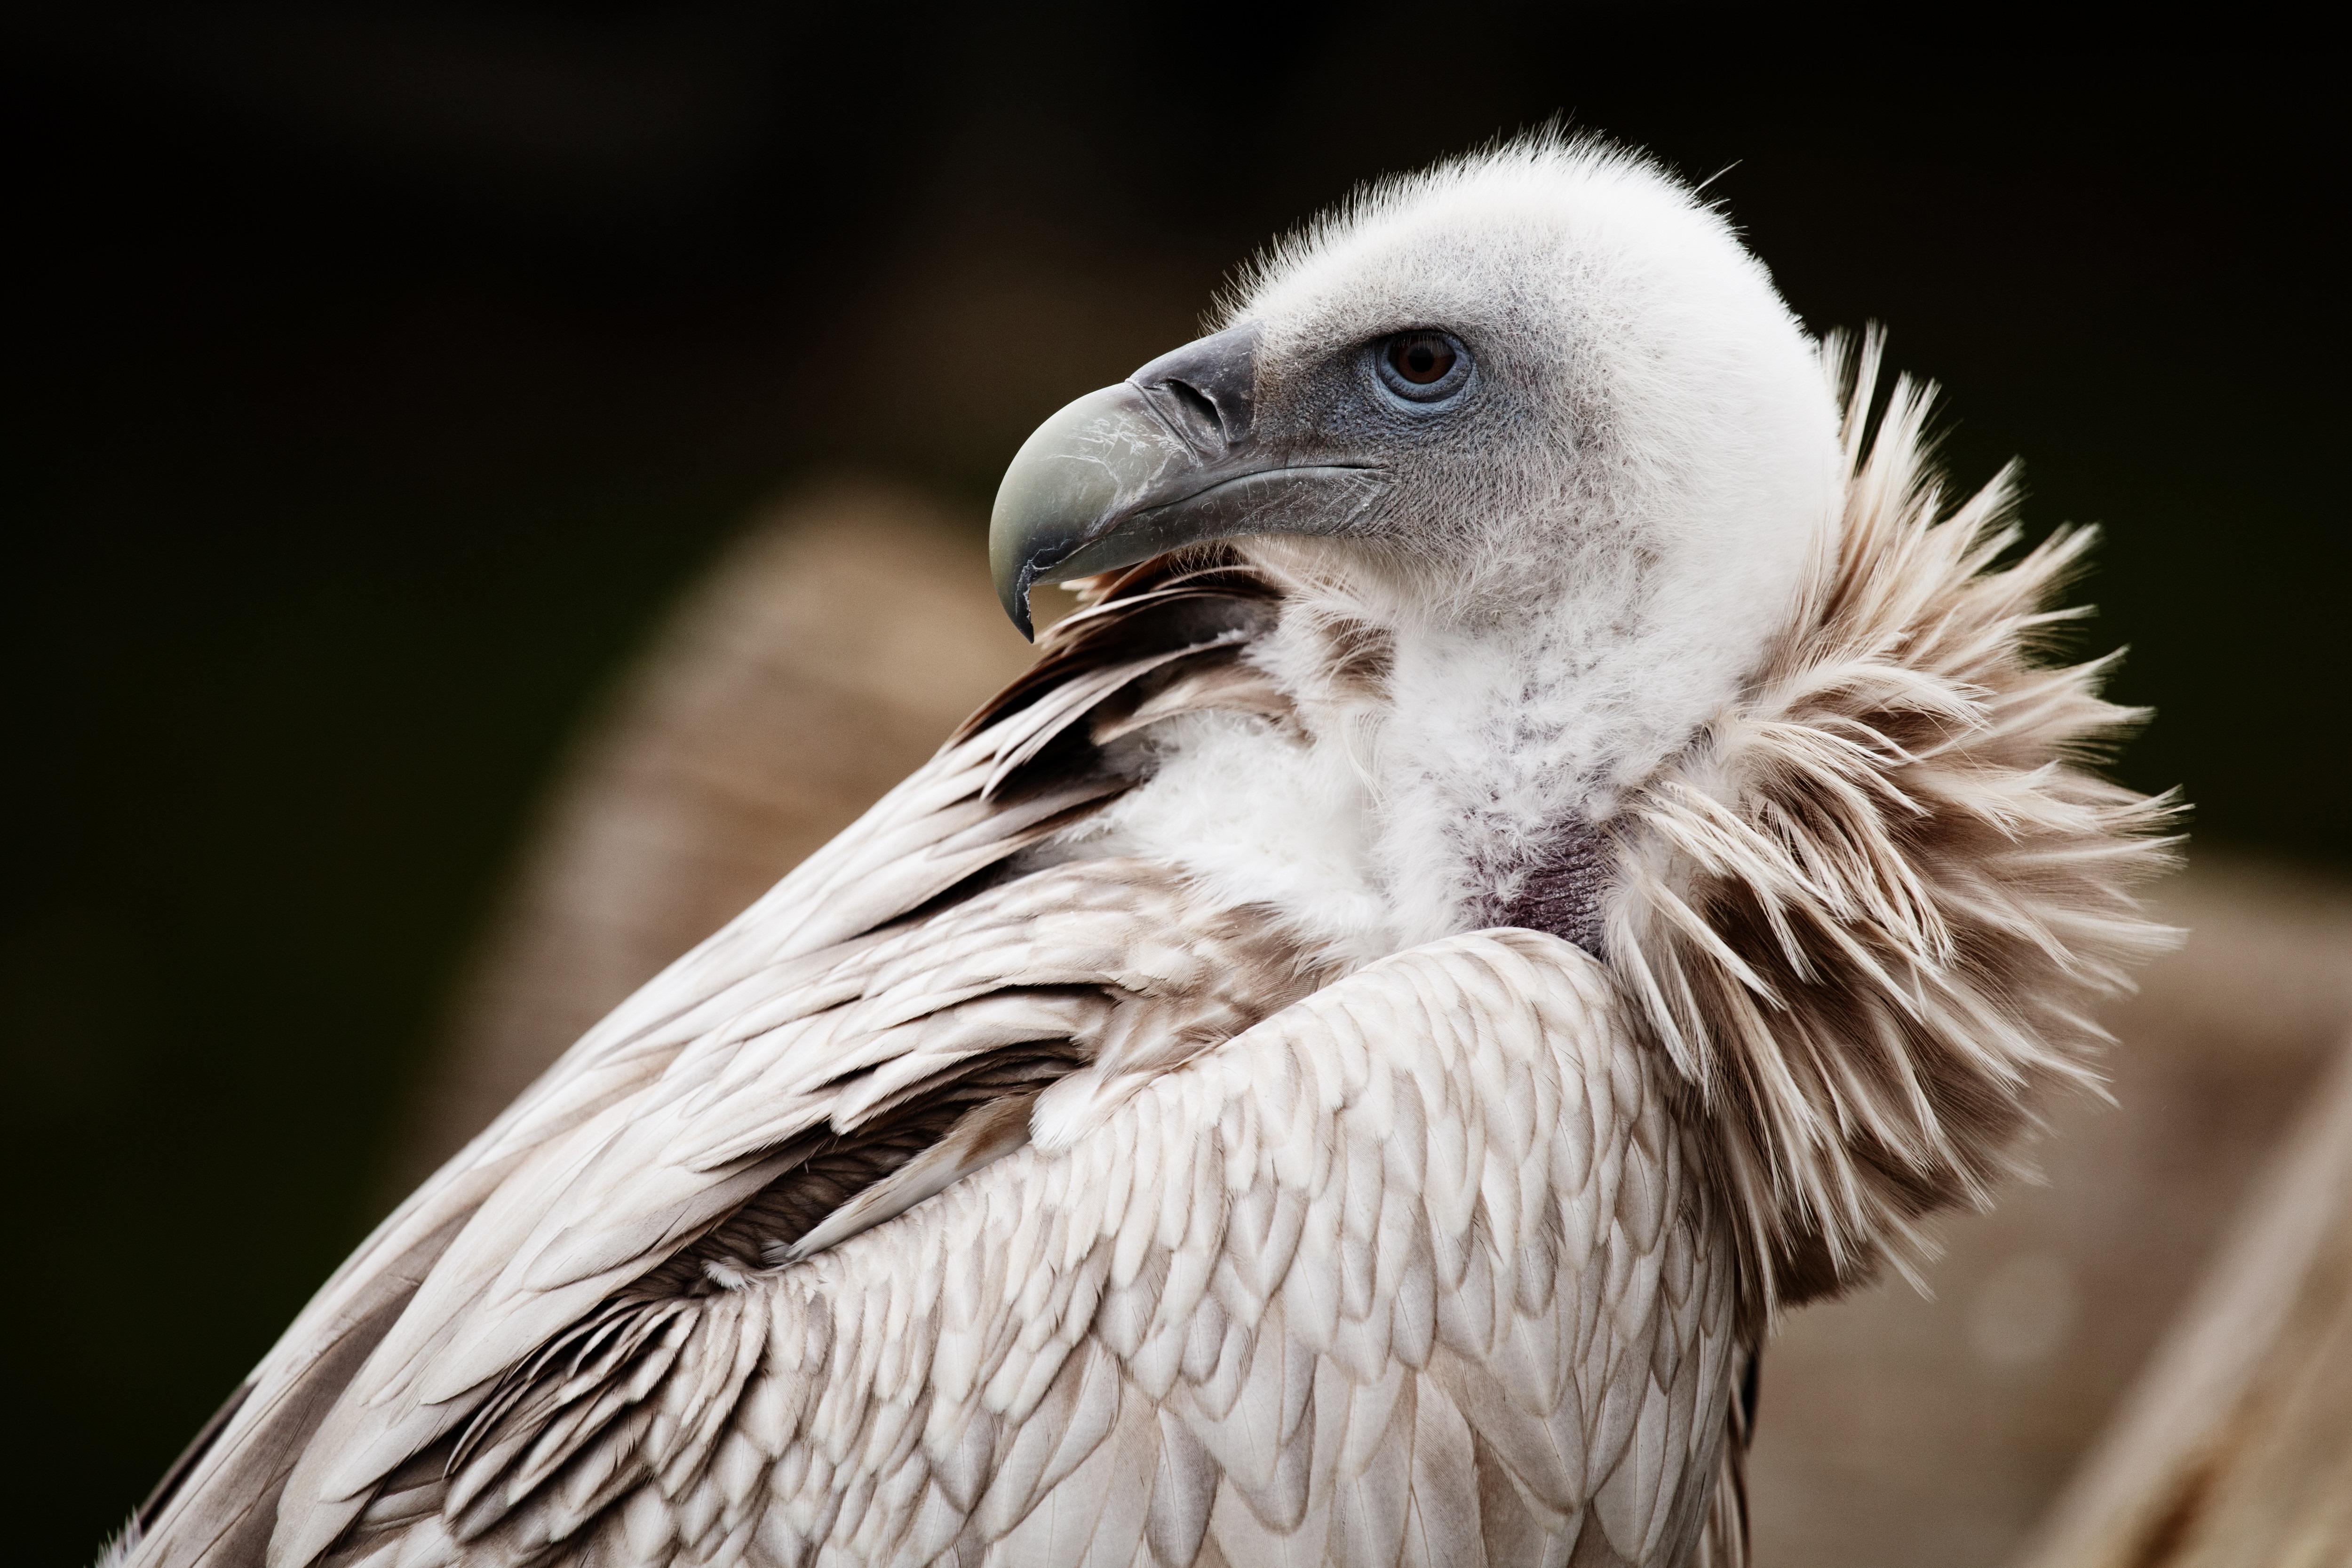 Fotos Gratis Pájaro Ala Animal Fauna Silvestre Retrato Pico